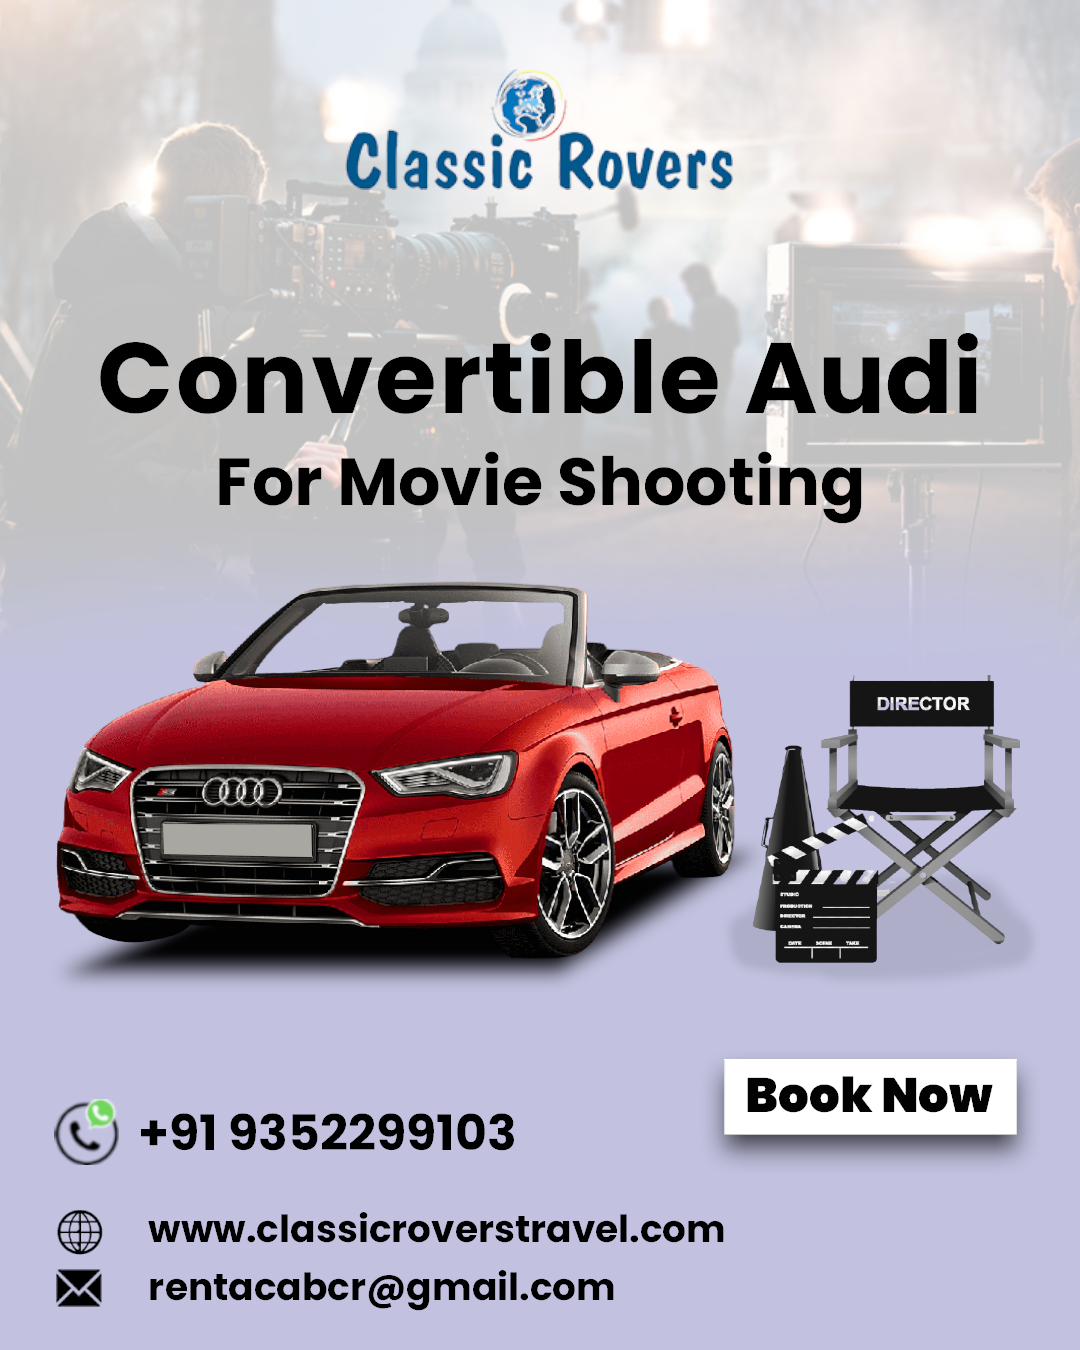 Book Convertible Audi For Movie Shooting Luxury Car Rental Car Rental Luxury Cars